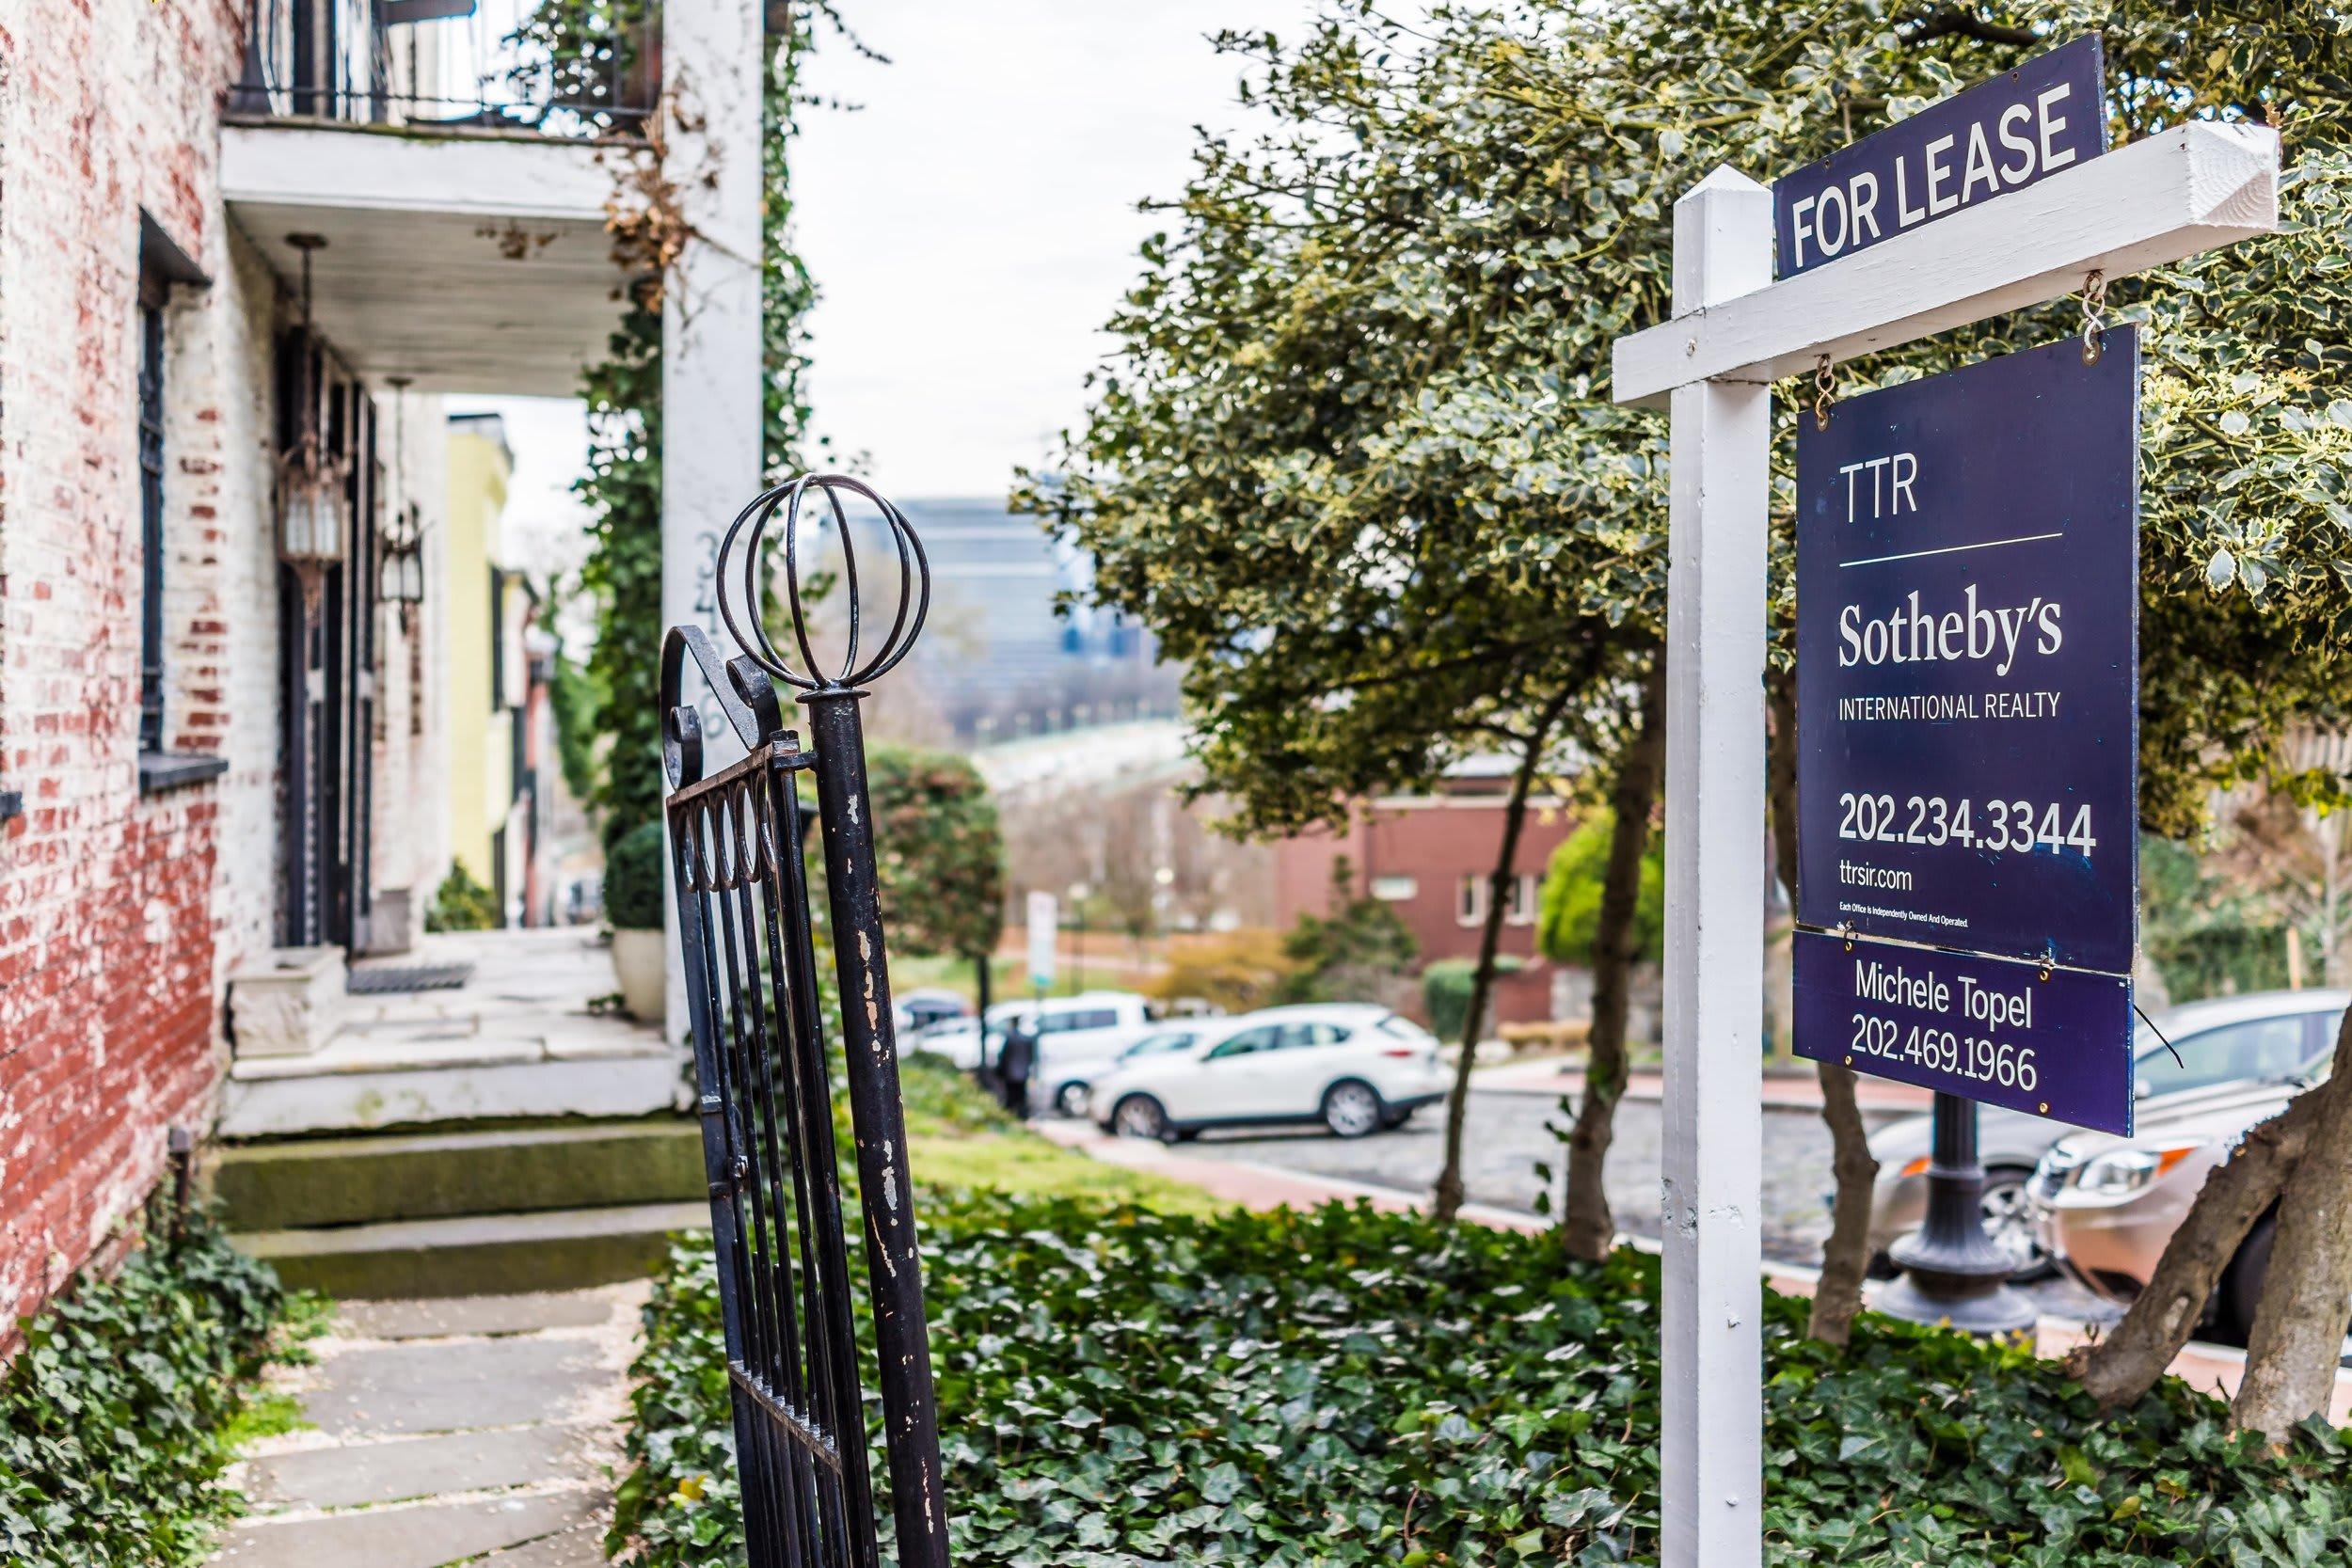 Updater Joins Sotheby's International Realty Marquis PrivilegesSM Program